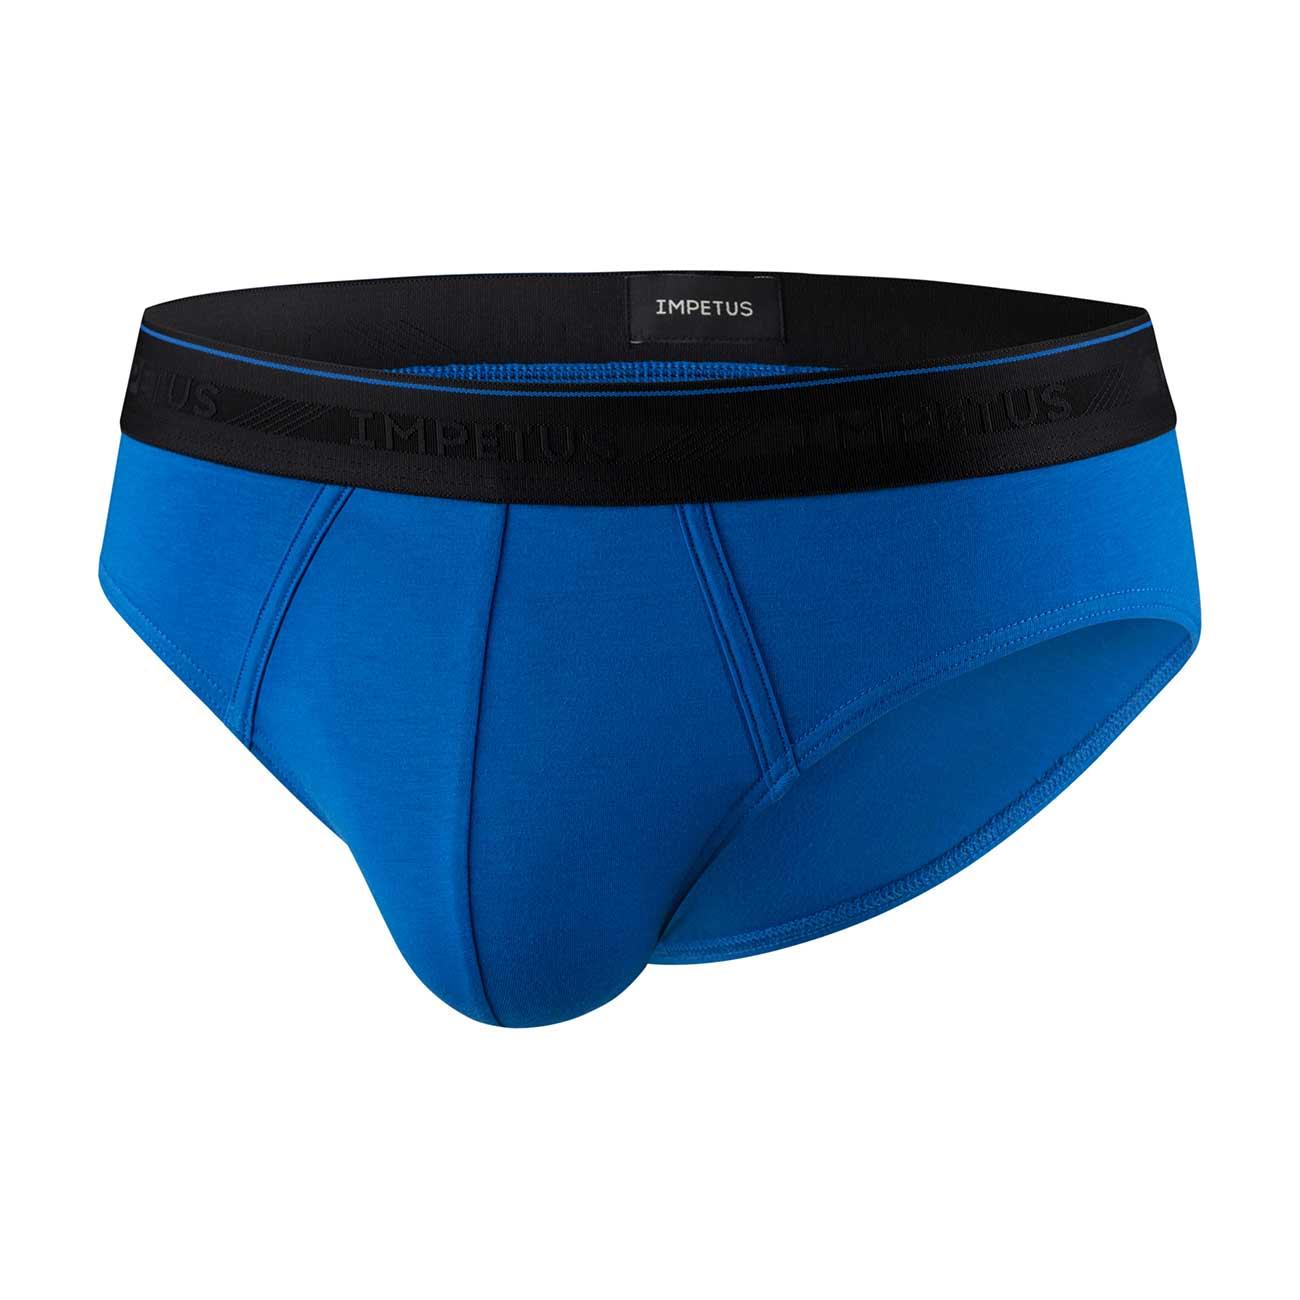 Slip Impetus με εξωτερικό λάστιχο - 0039b89 μπλε ρουά - S